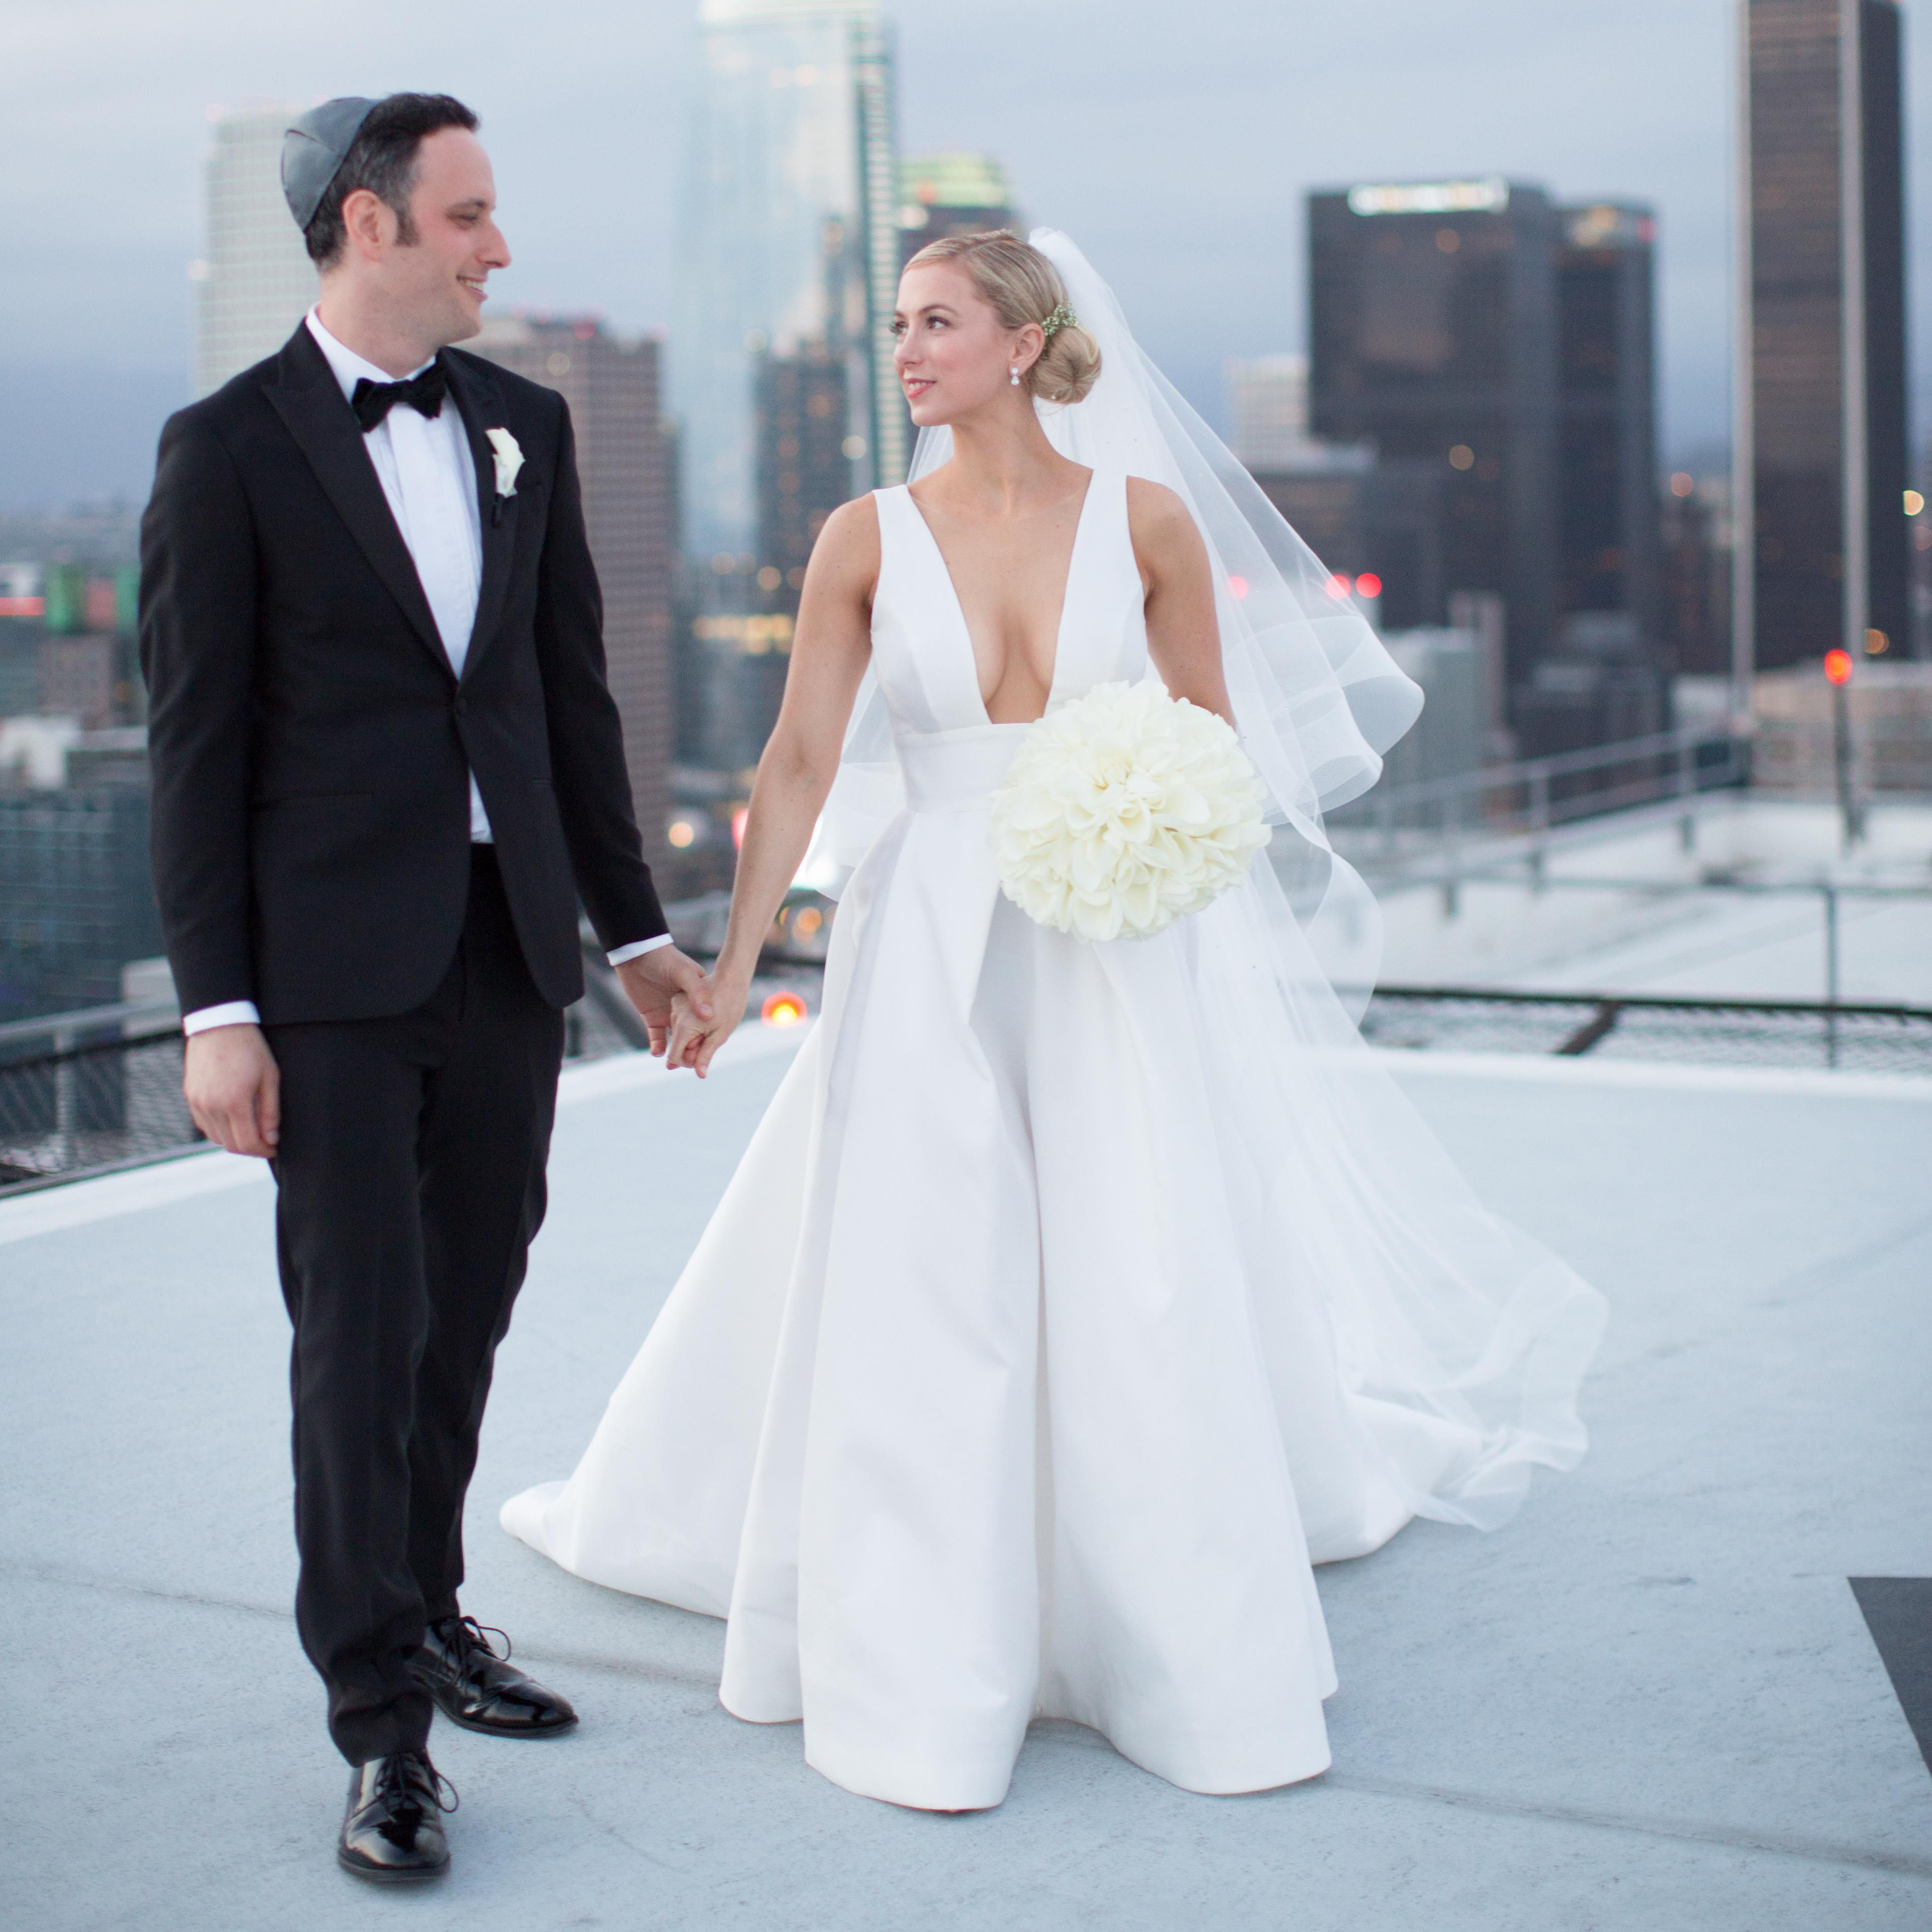 Comedian Iliza Shlesinger S Modern Wedding Celebration In L A